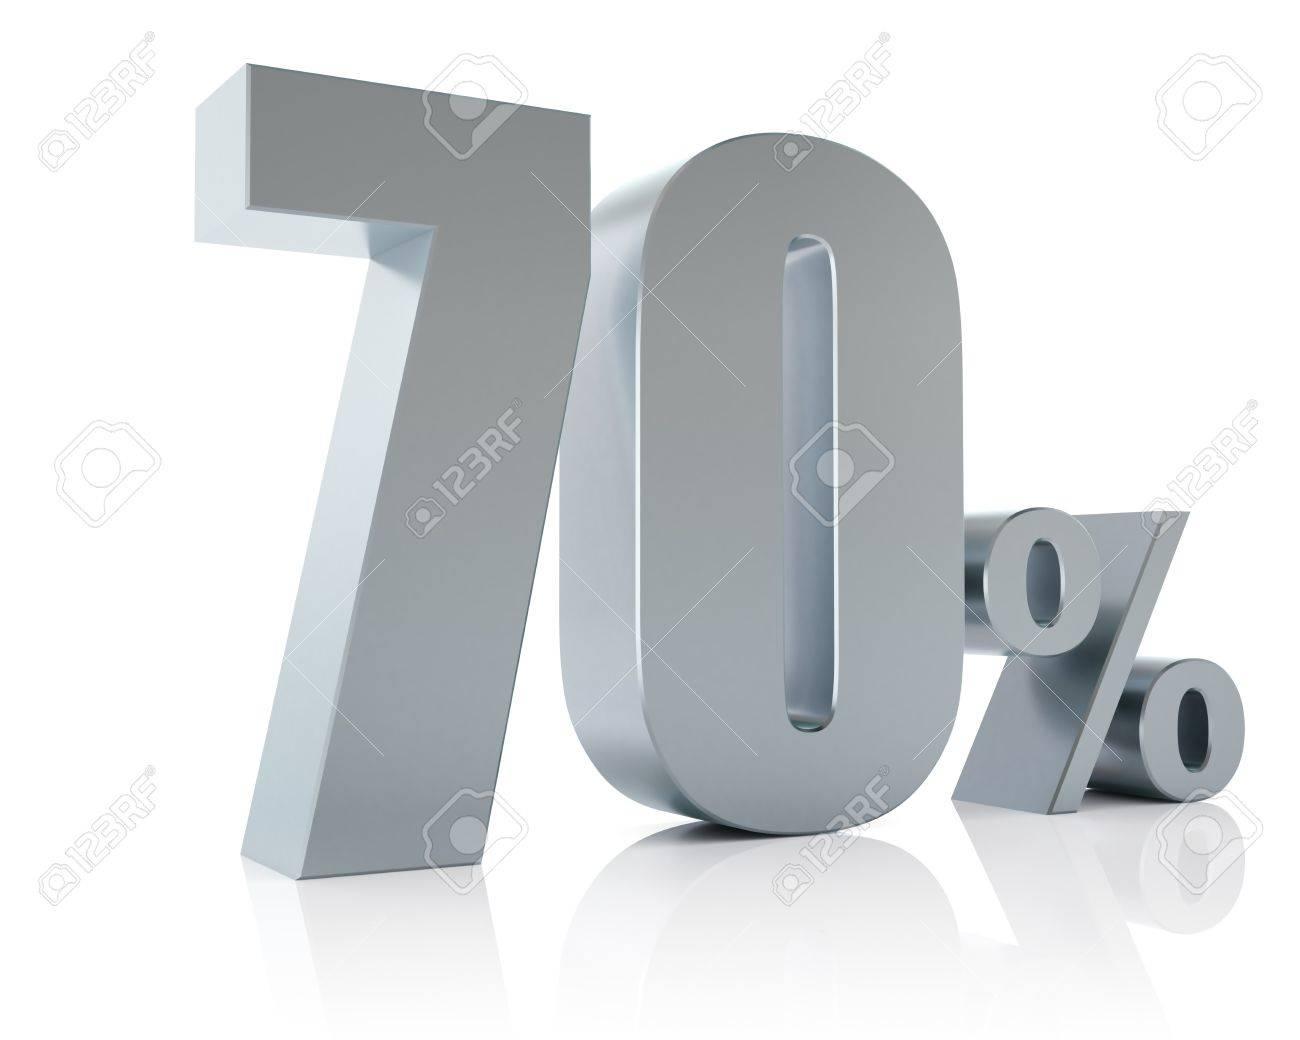 Seventy percent metallic discount symbol Stock Photo - 14192111